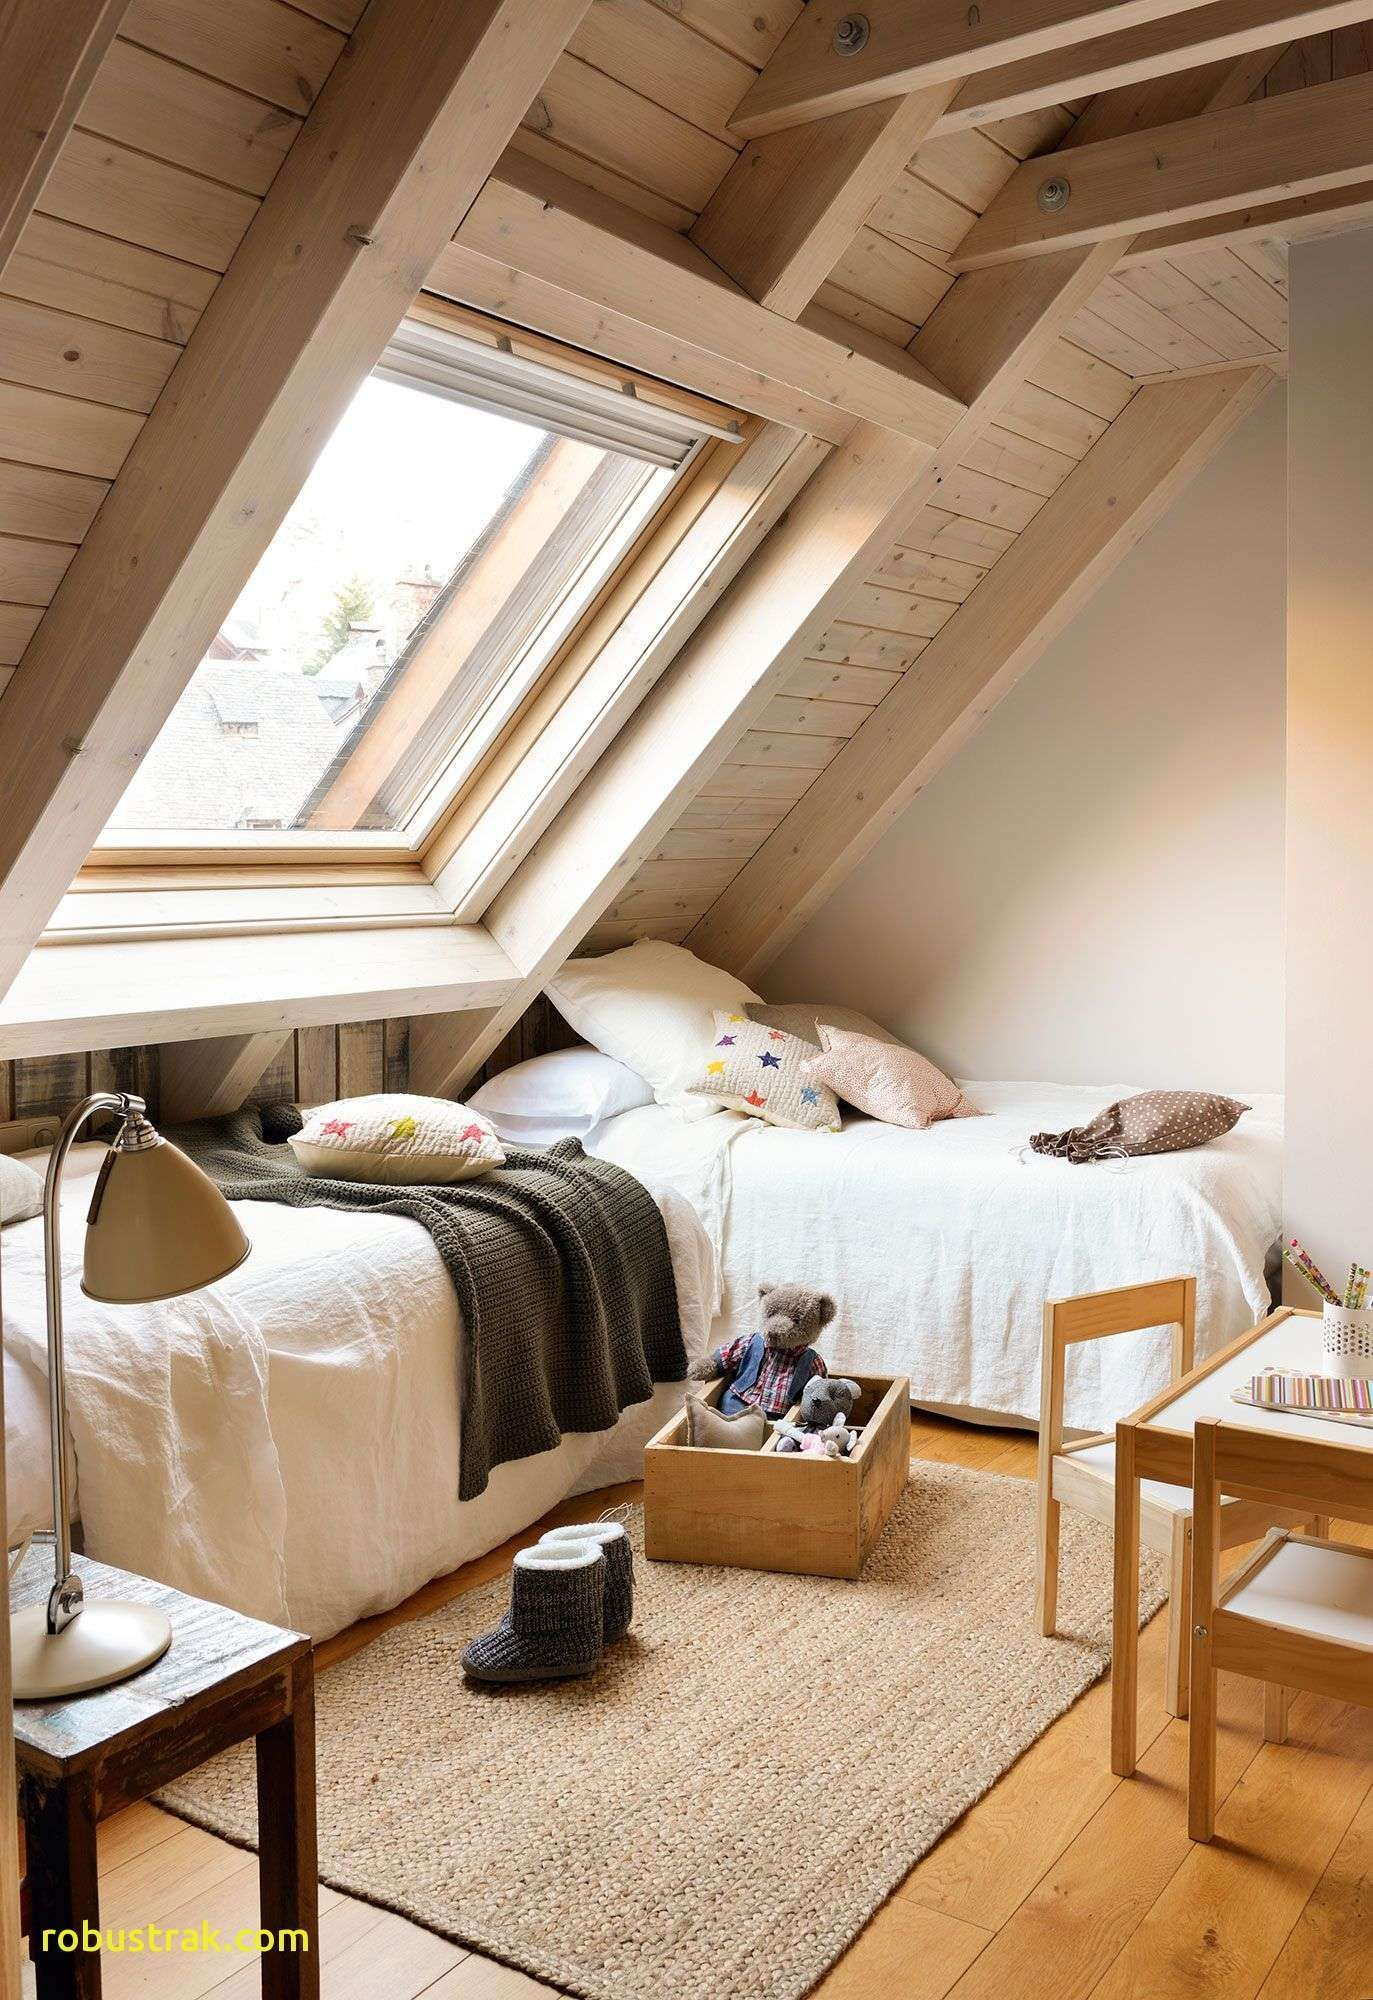 Attic room or bedroom